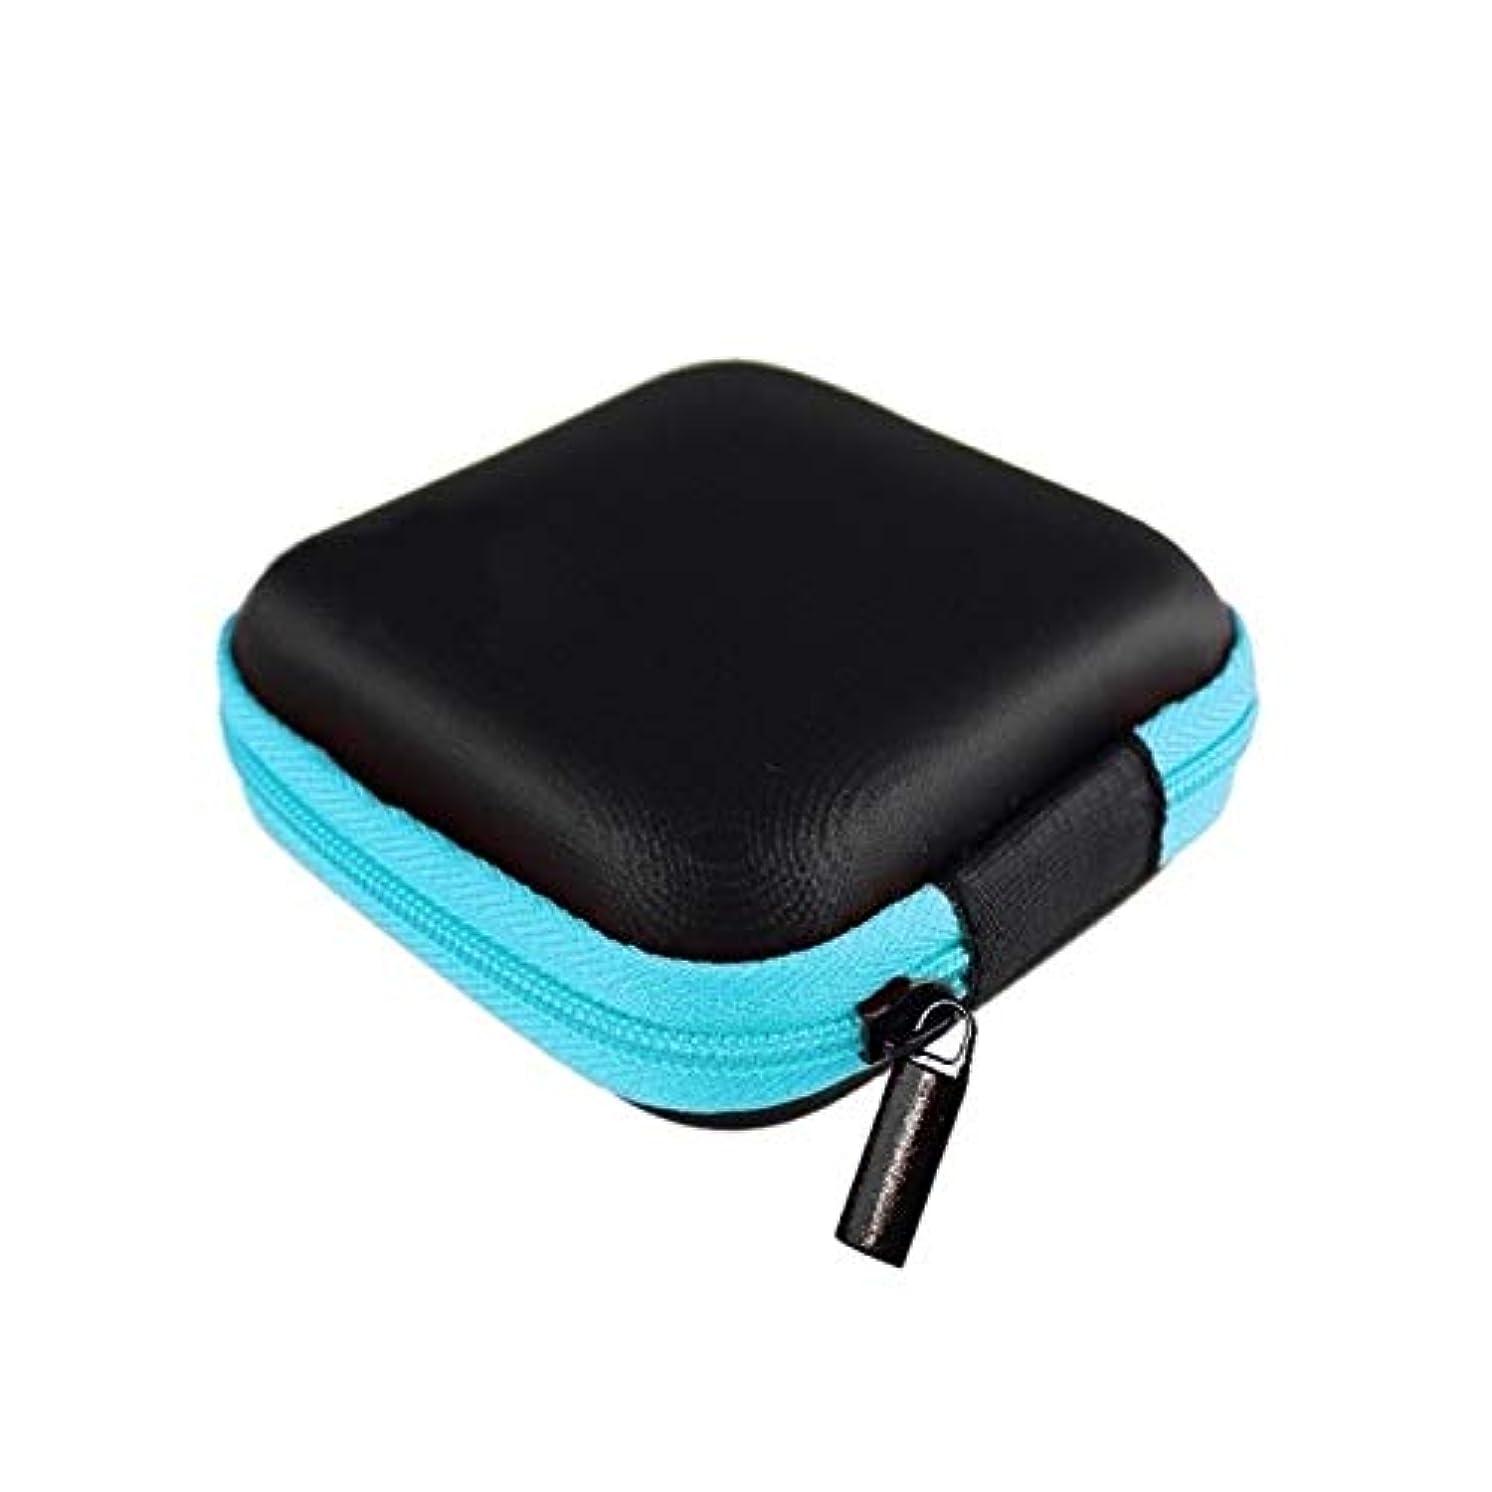 Square Earphone Wire Organizer Box Data Line Cables Storage Box Case Container Coin Headphone Protective Box 8cm